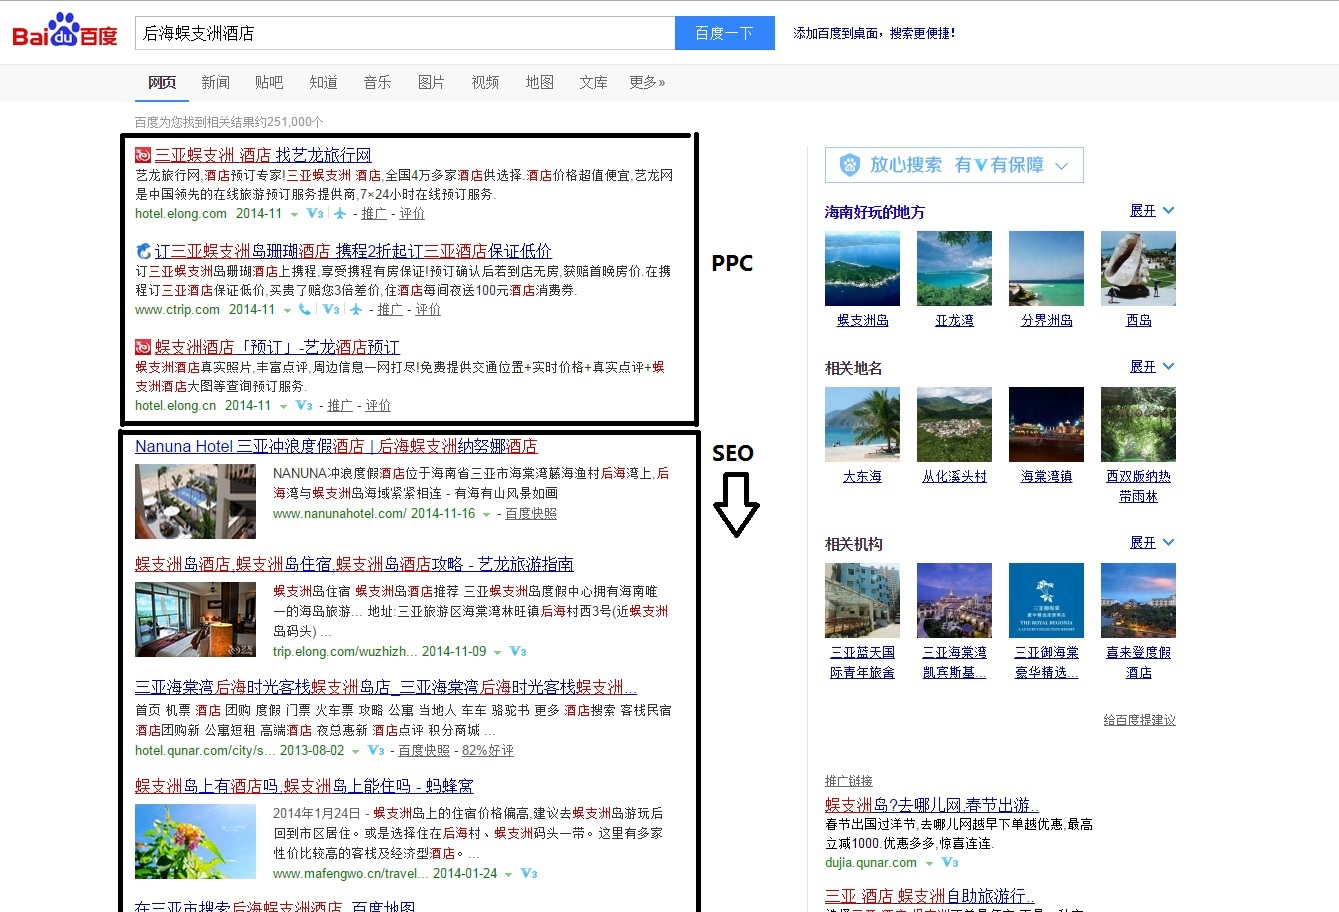 Baidu SEO Result